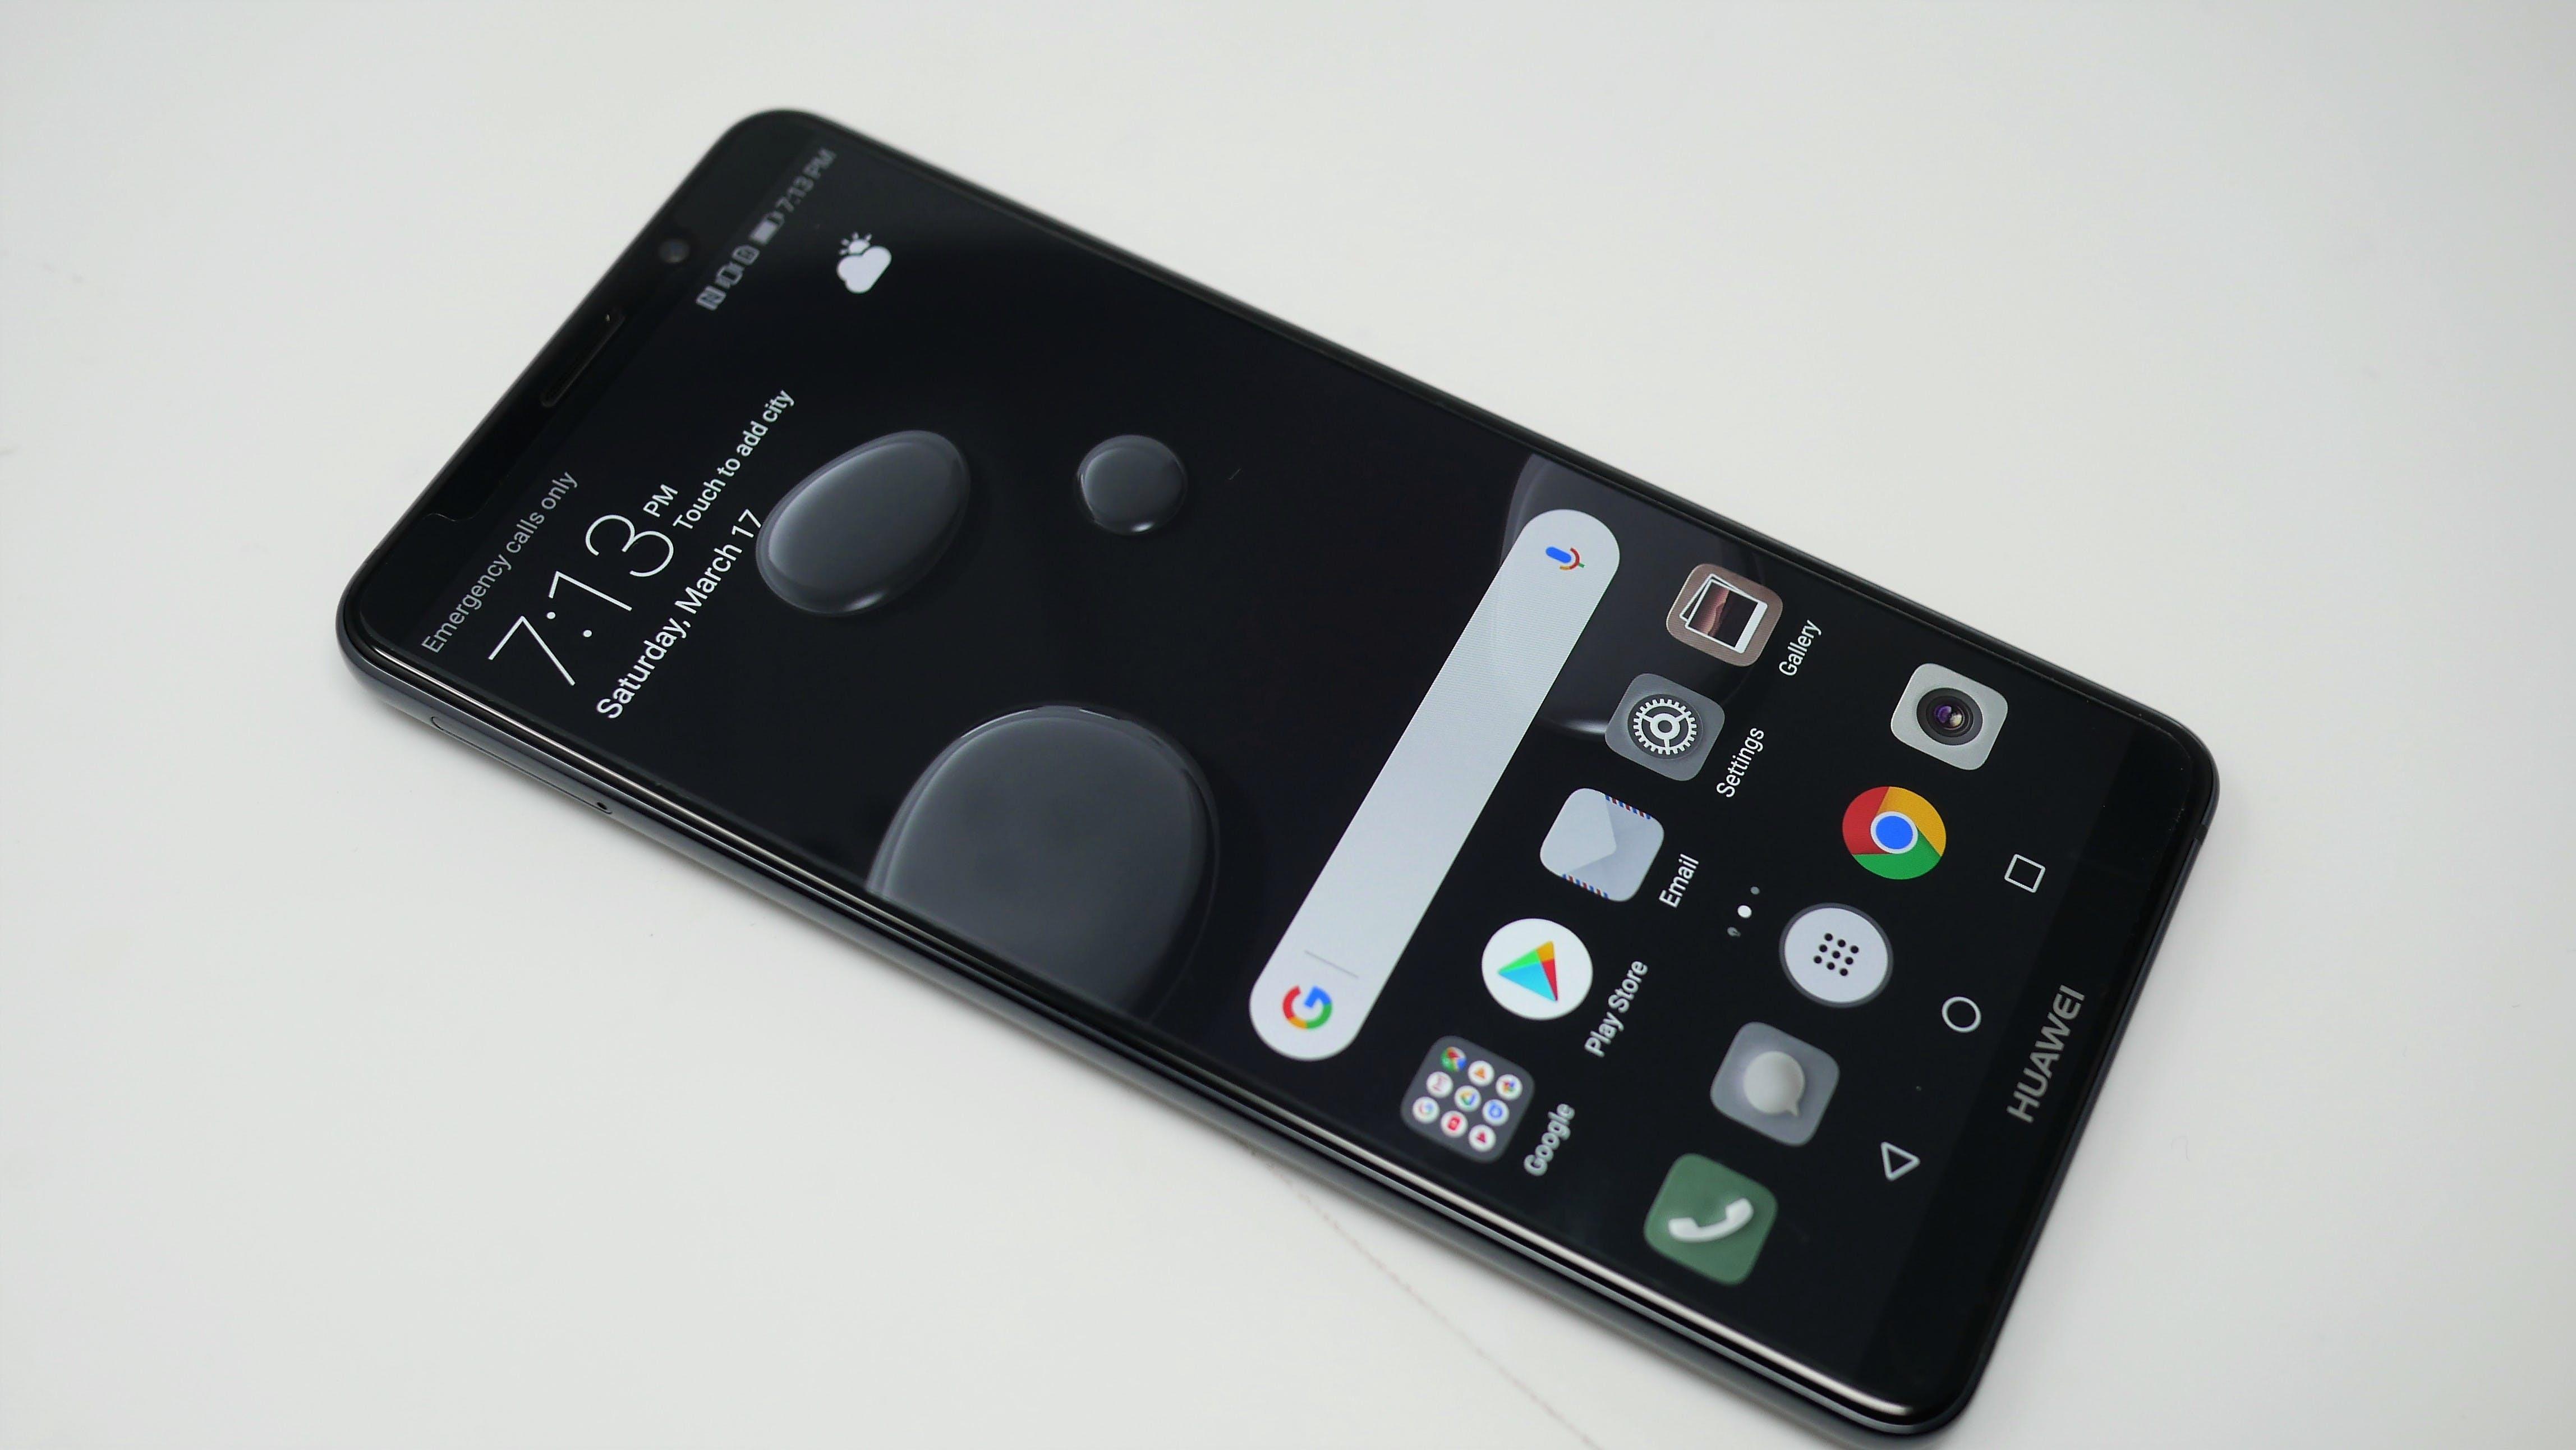 best phones 2018 - Huawei Mate 10 pro Front display screen